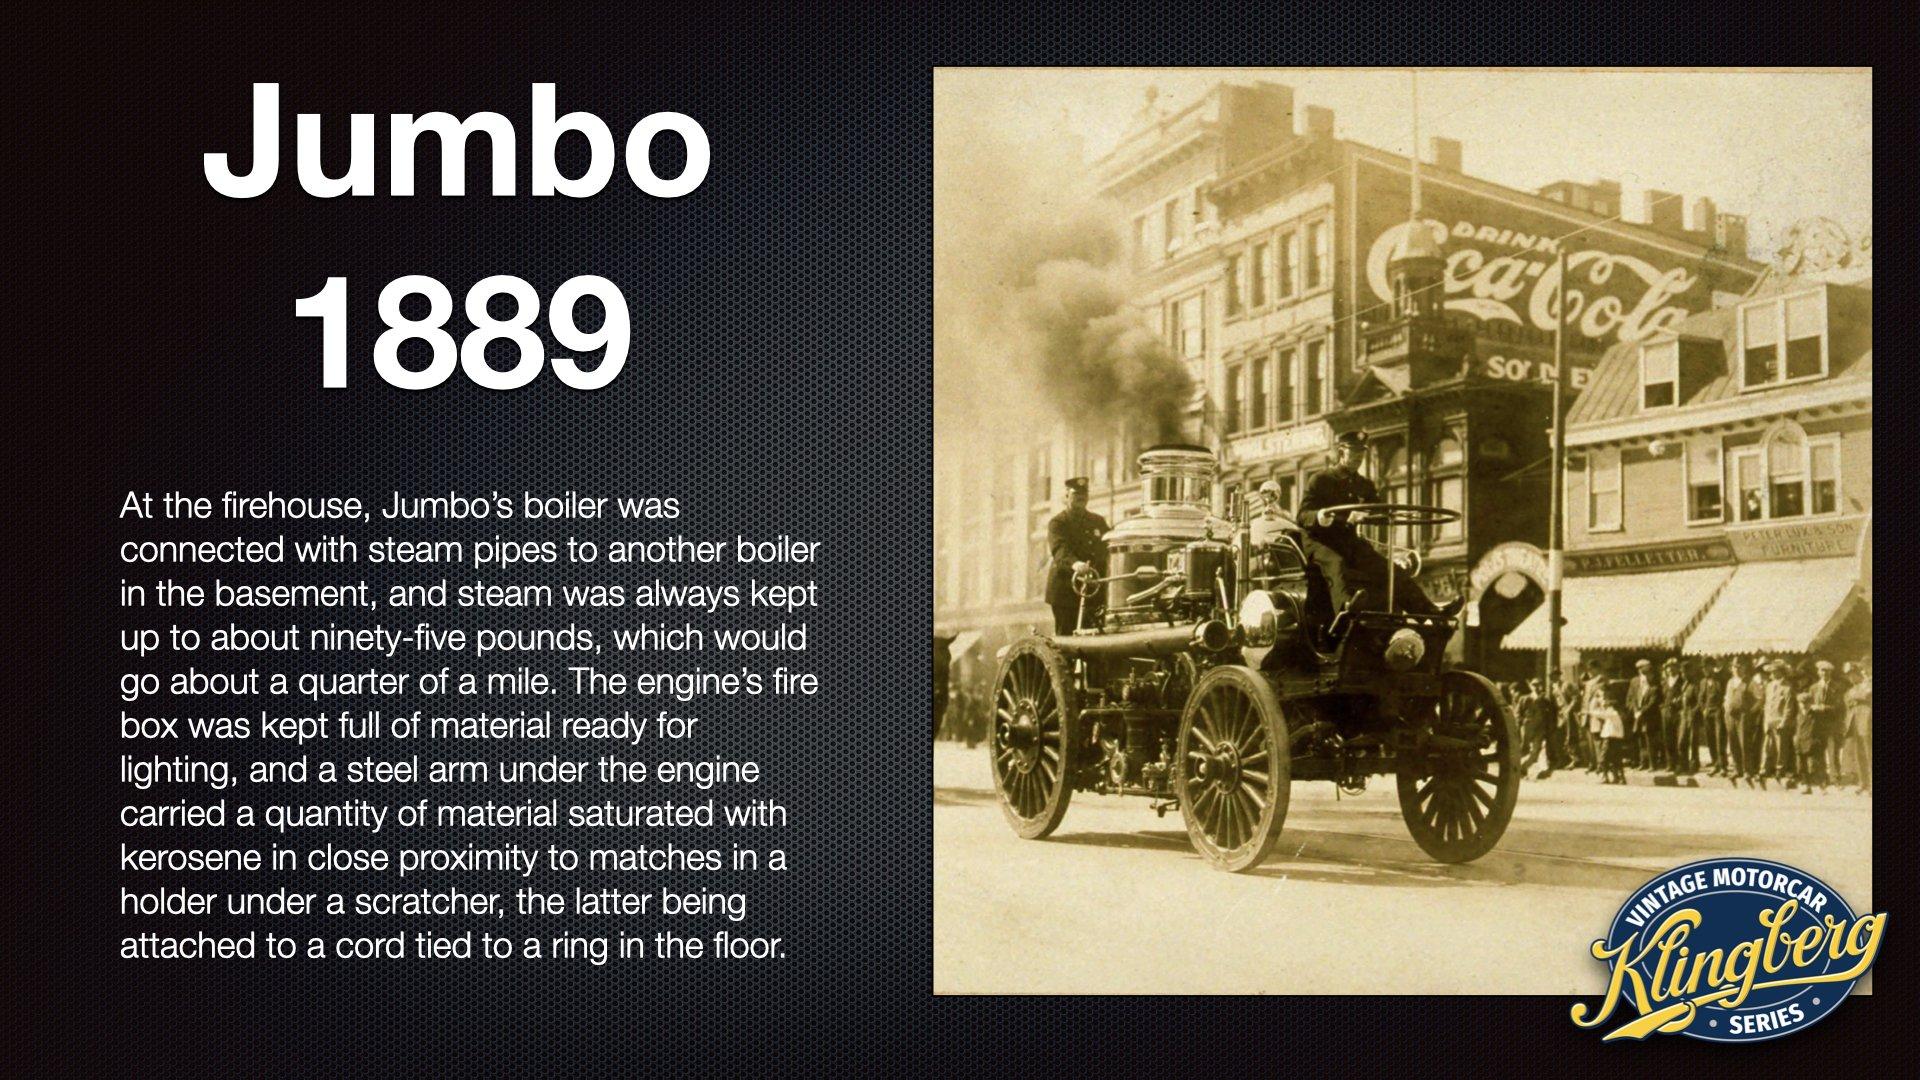 Jumbo Fire Truck